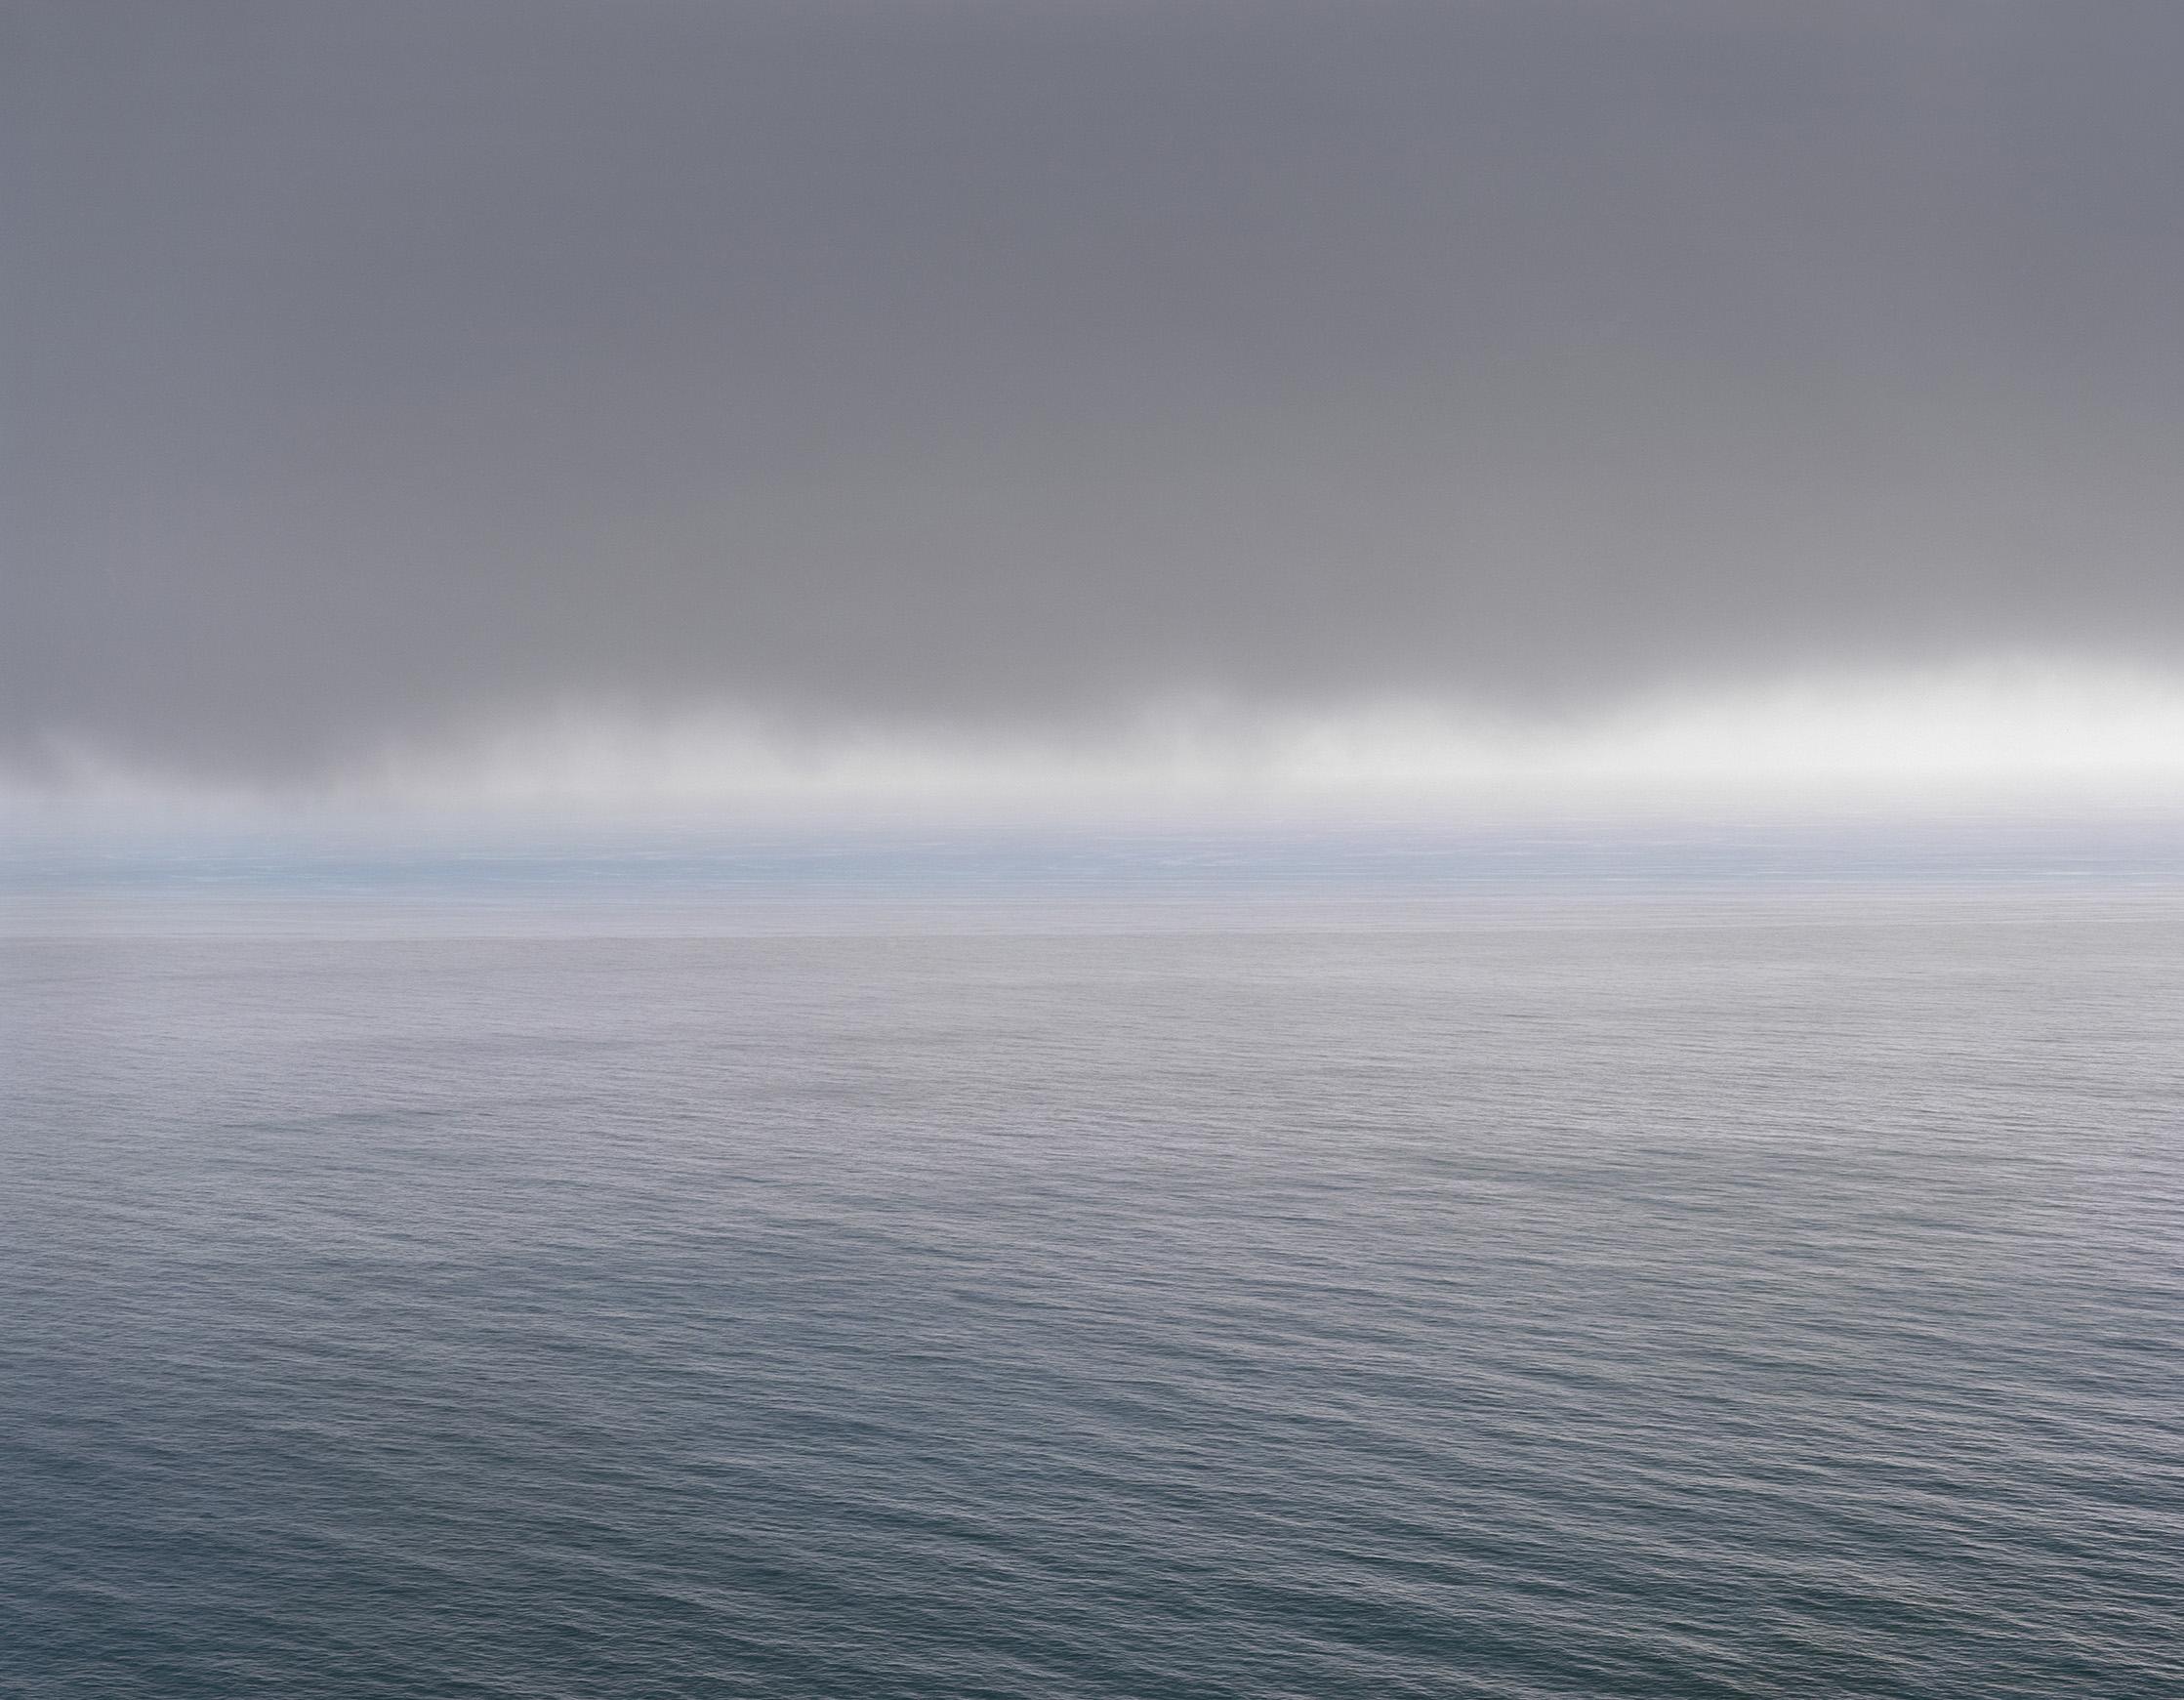 Toward The Pacific Ocean, California